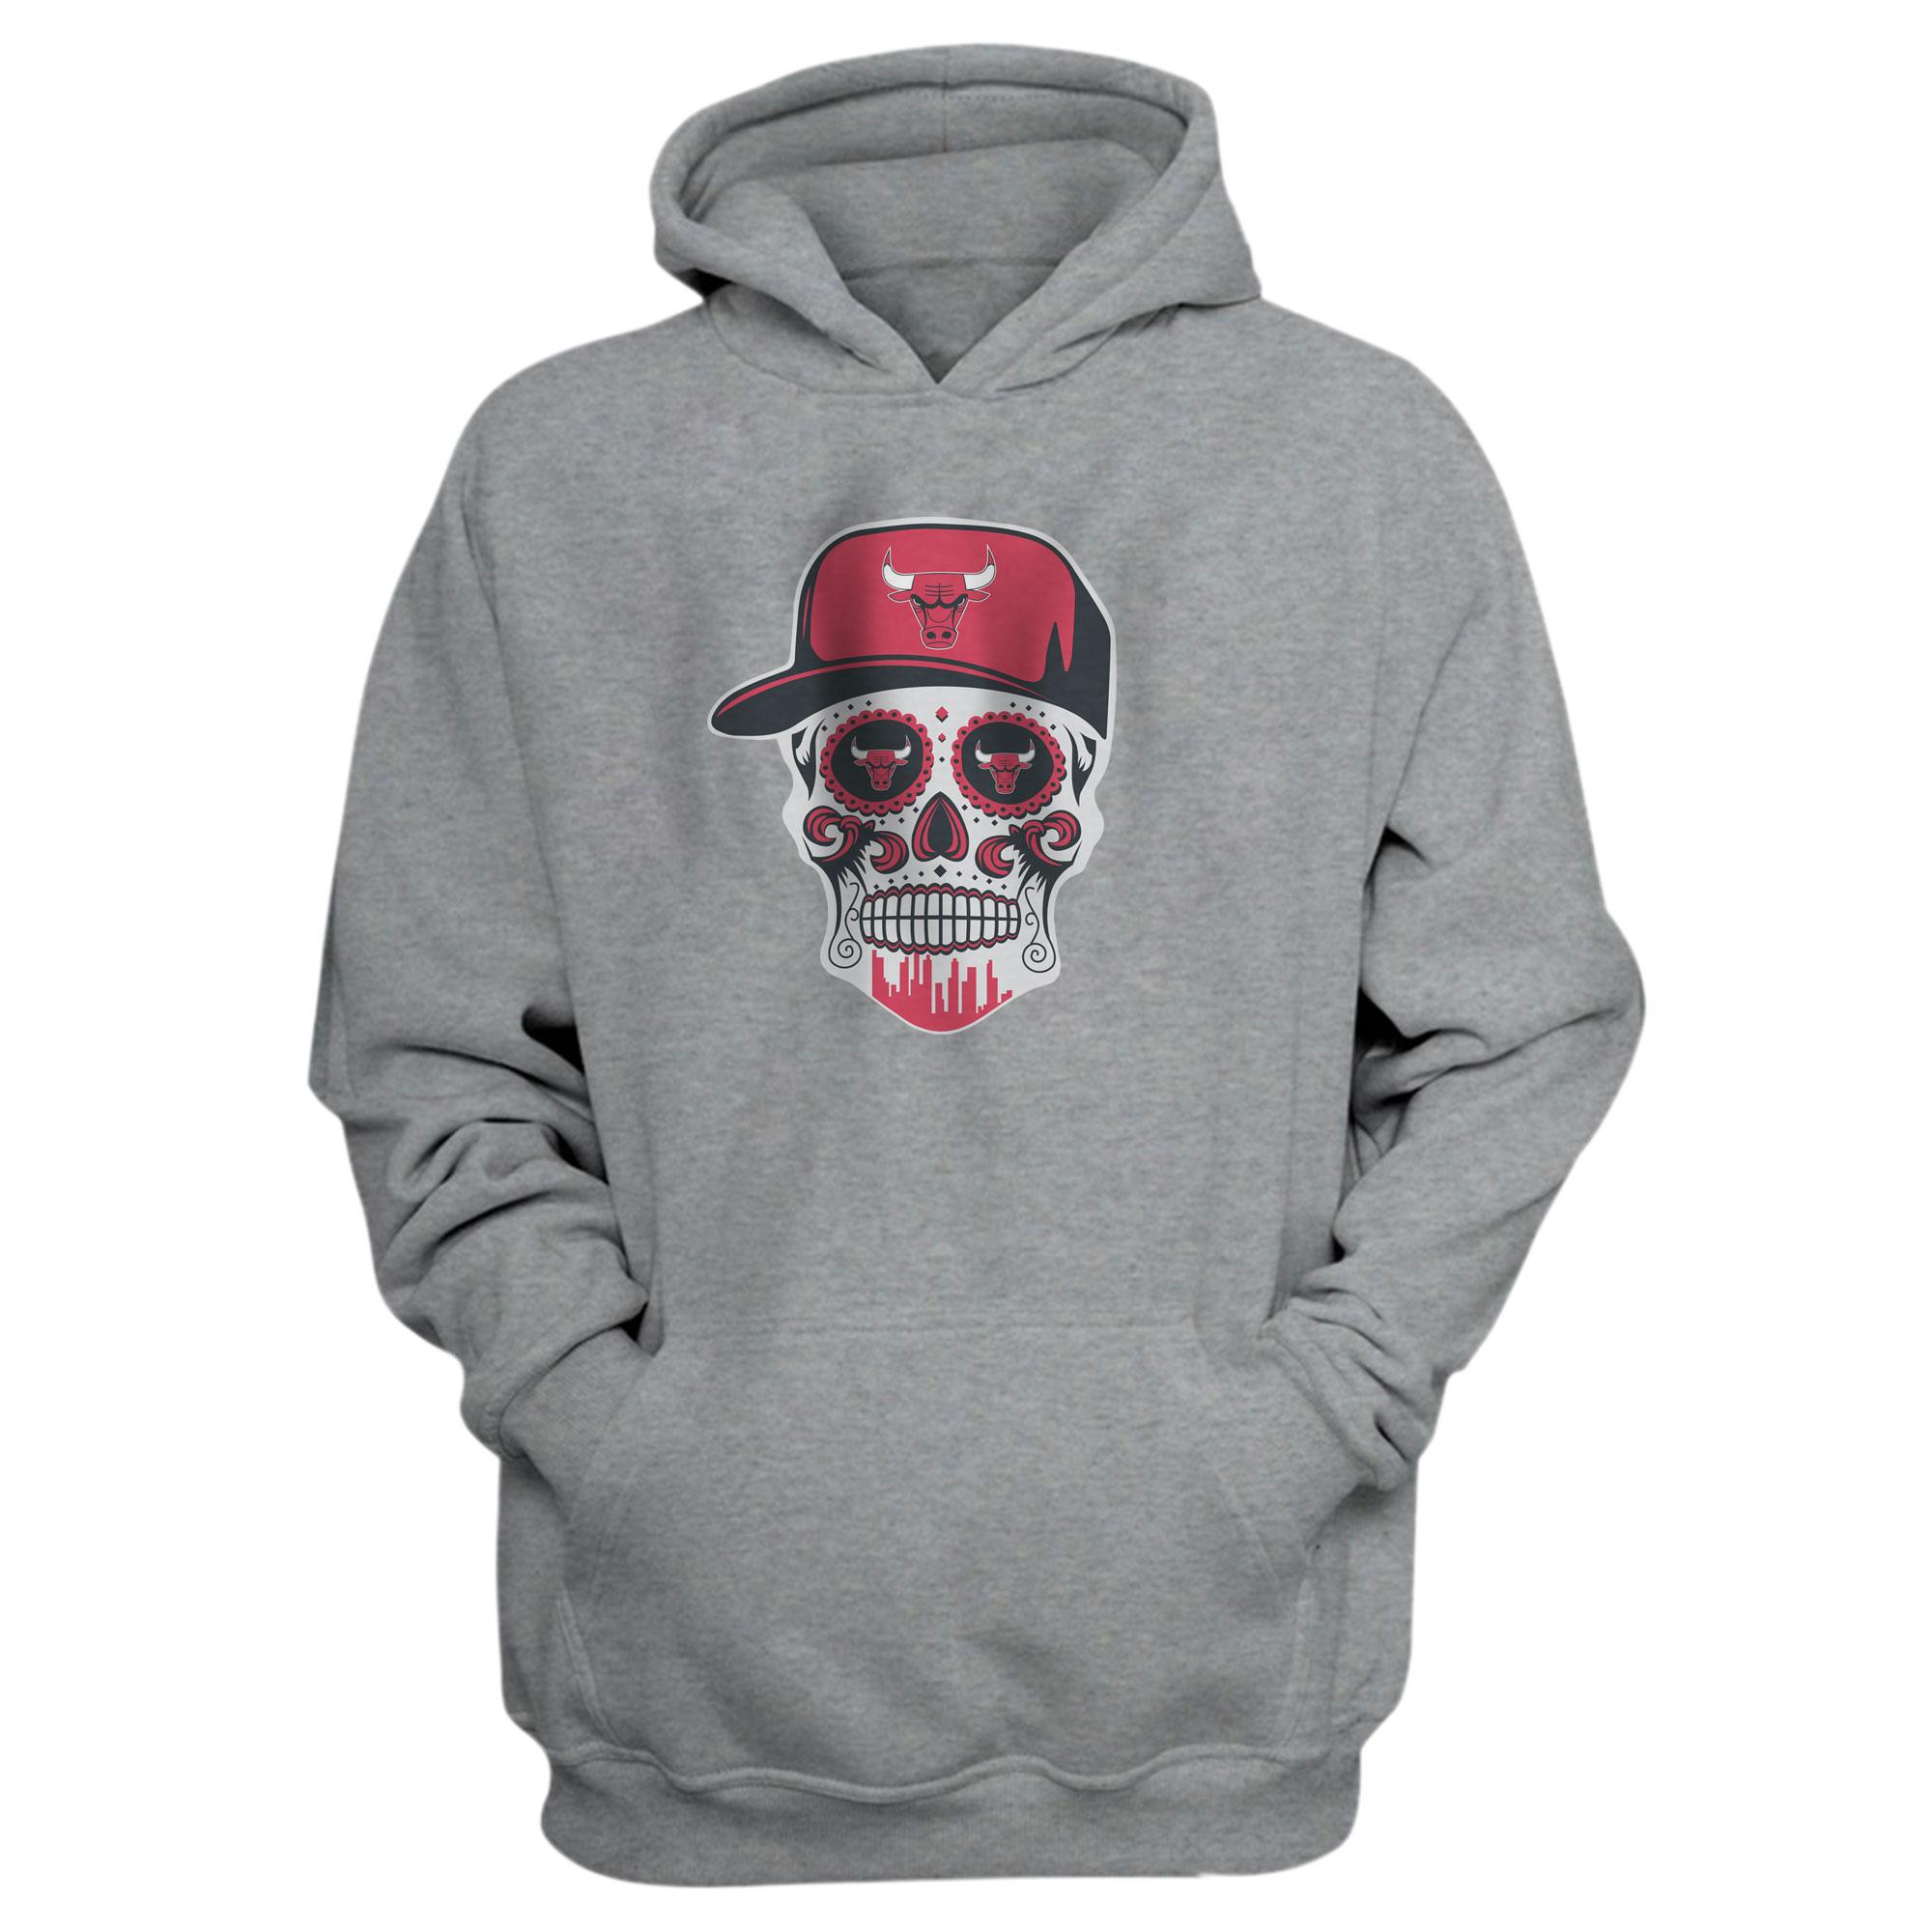 Bulls Skull Hoodie (HD-GRY-NP-447-NBA-BULLS-SKULL)